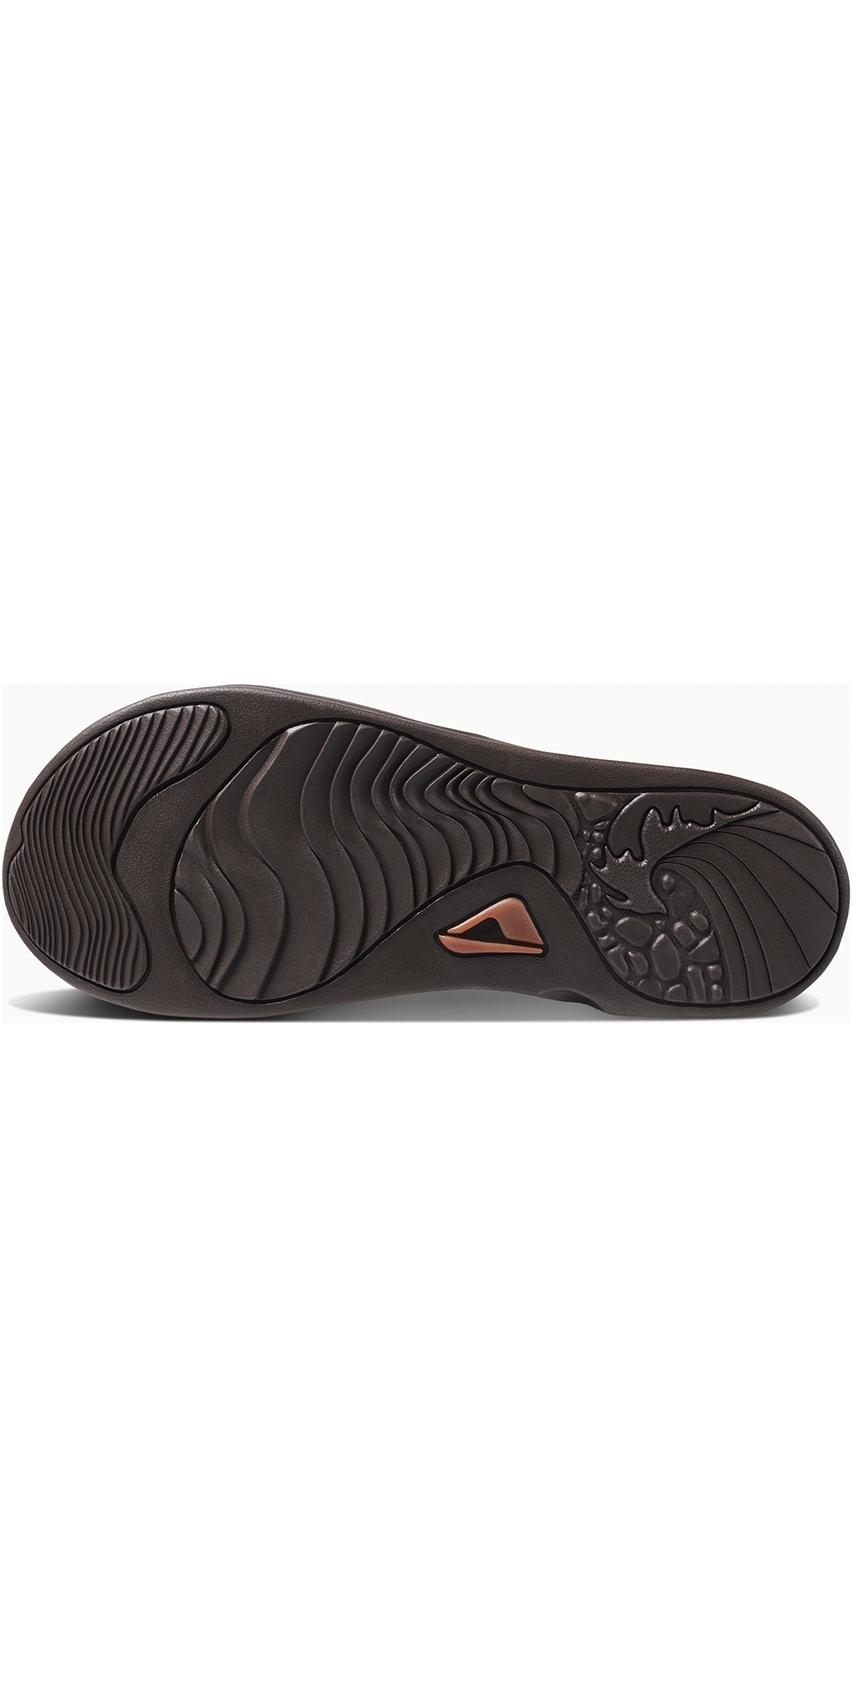 ad06ca1c0dfc 2019 Reef Mens J-Bay III Flip Flops Coffee   Bronze RF002616 ...